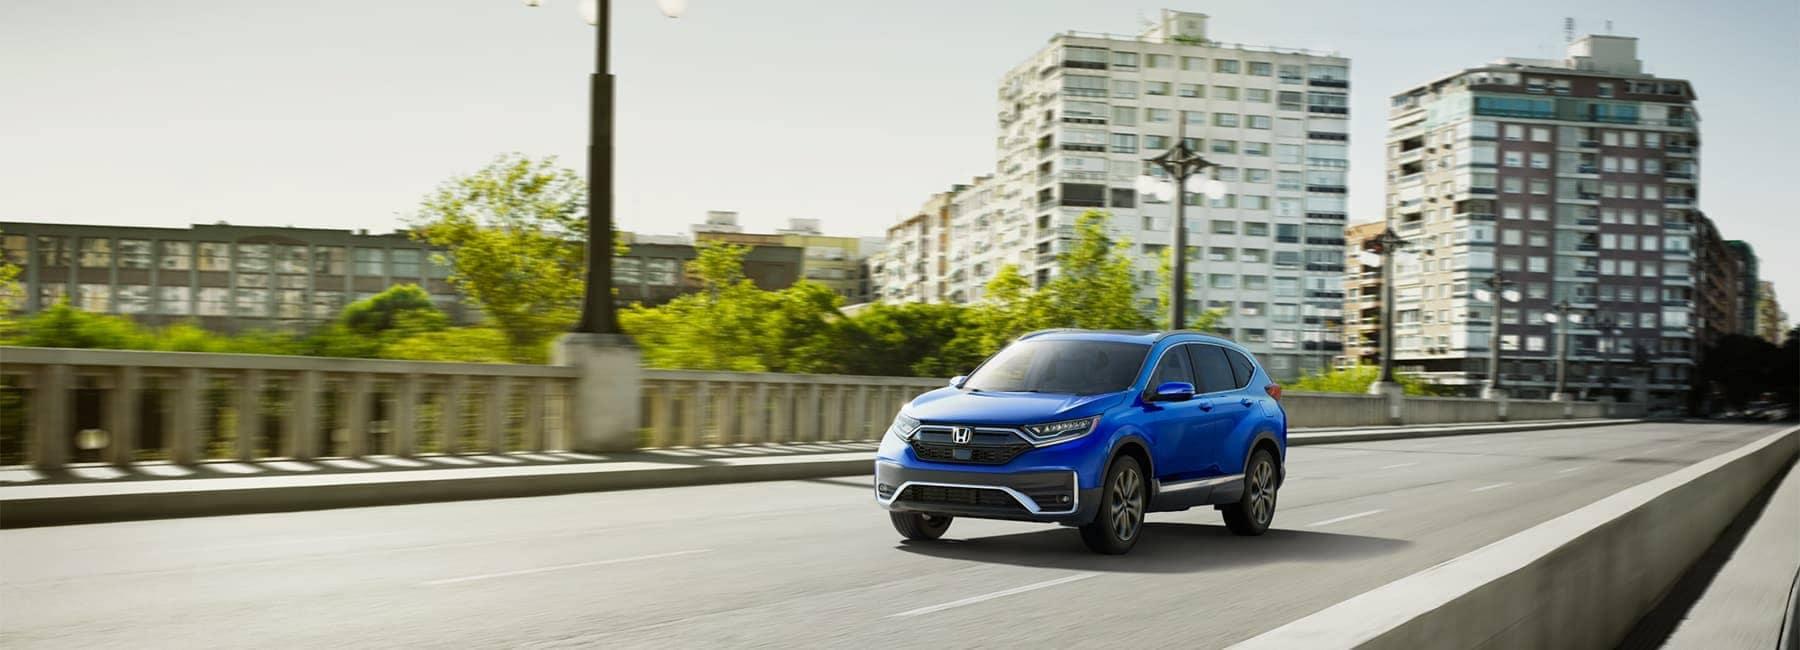 2020-Honda-CR-V-driving-on-a-bridge